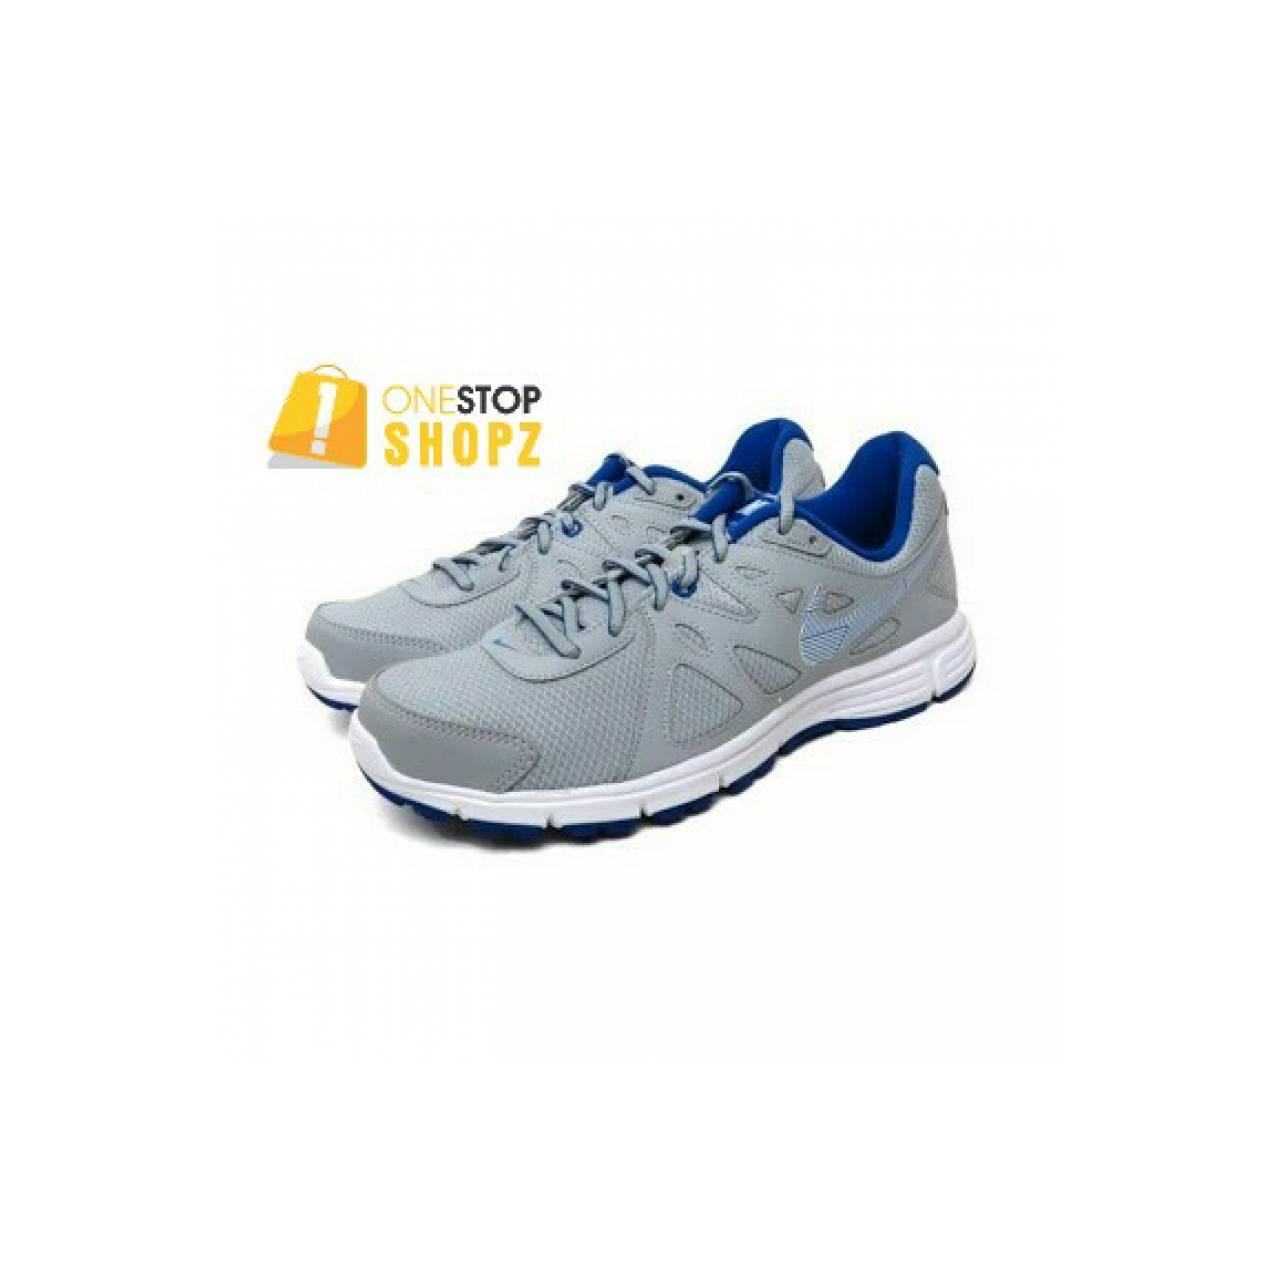 Nike Air Relentless 6 Msl 843881006 Sepatu Lari Running Pria Black Relentless6 Hitam Putih Abu Source Wmns Medium